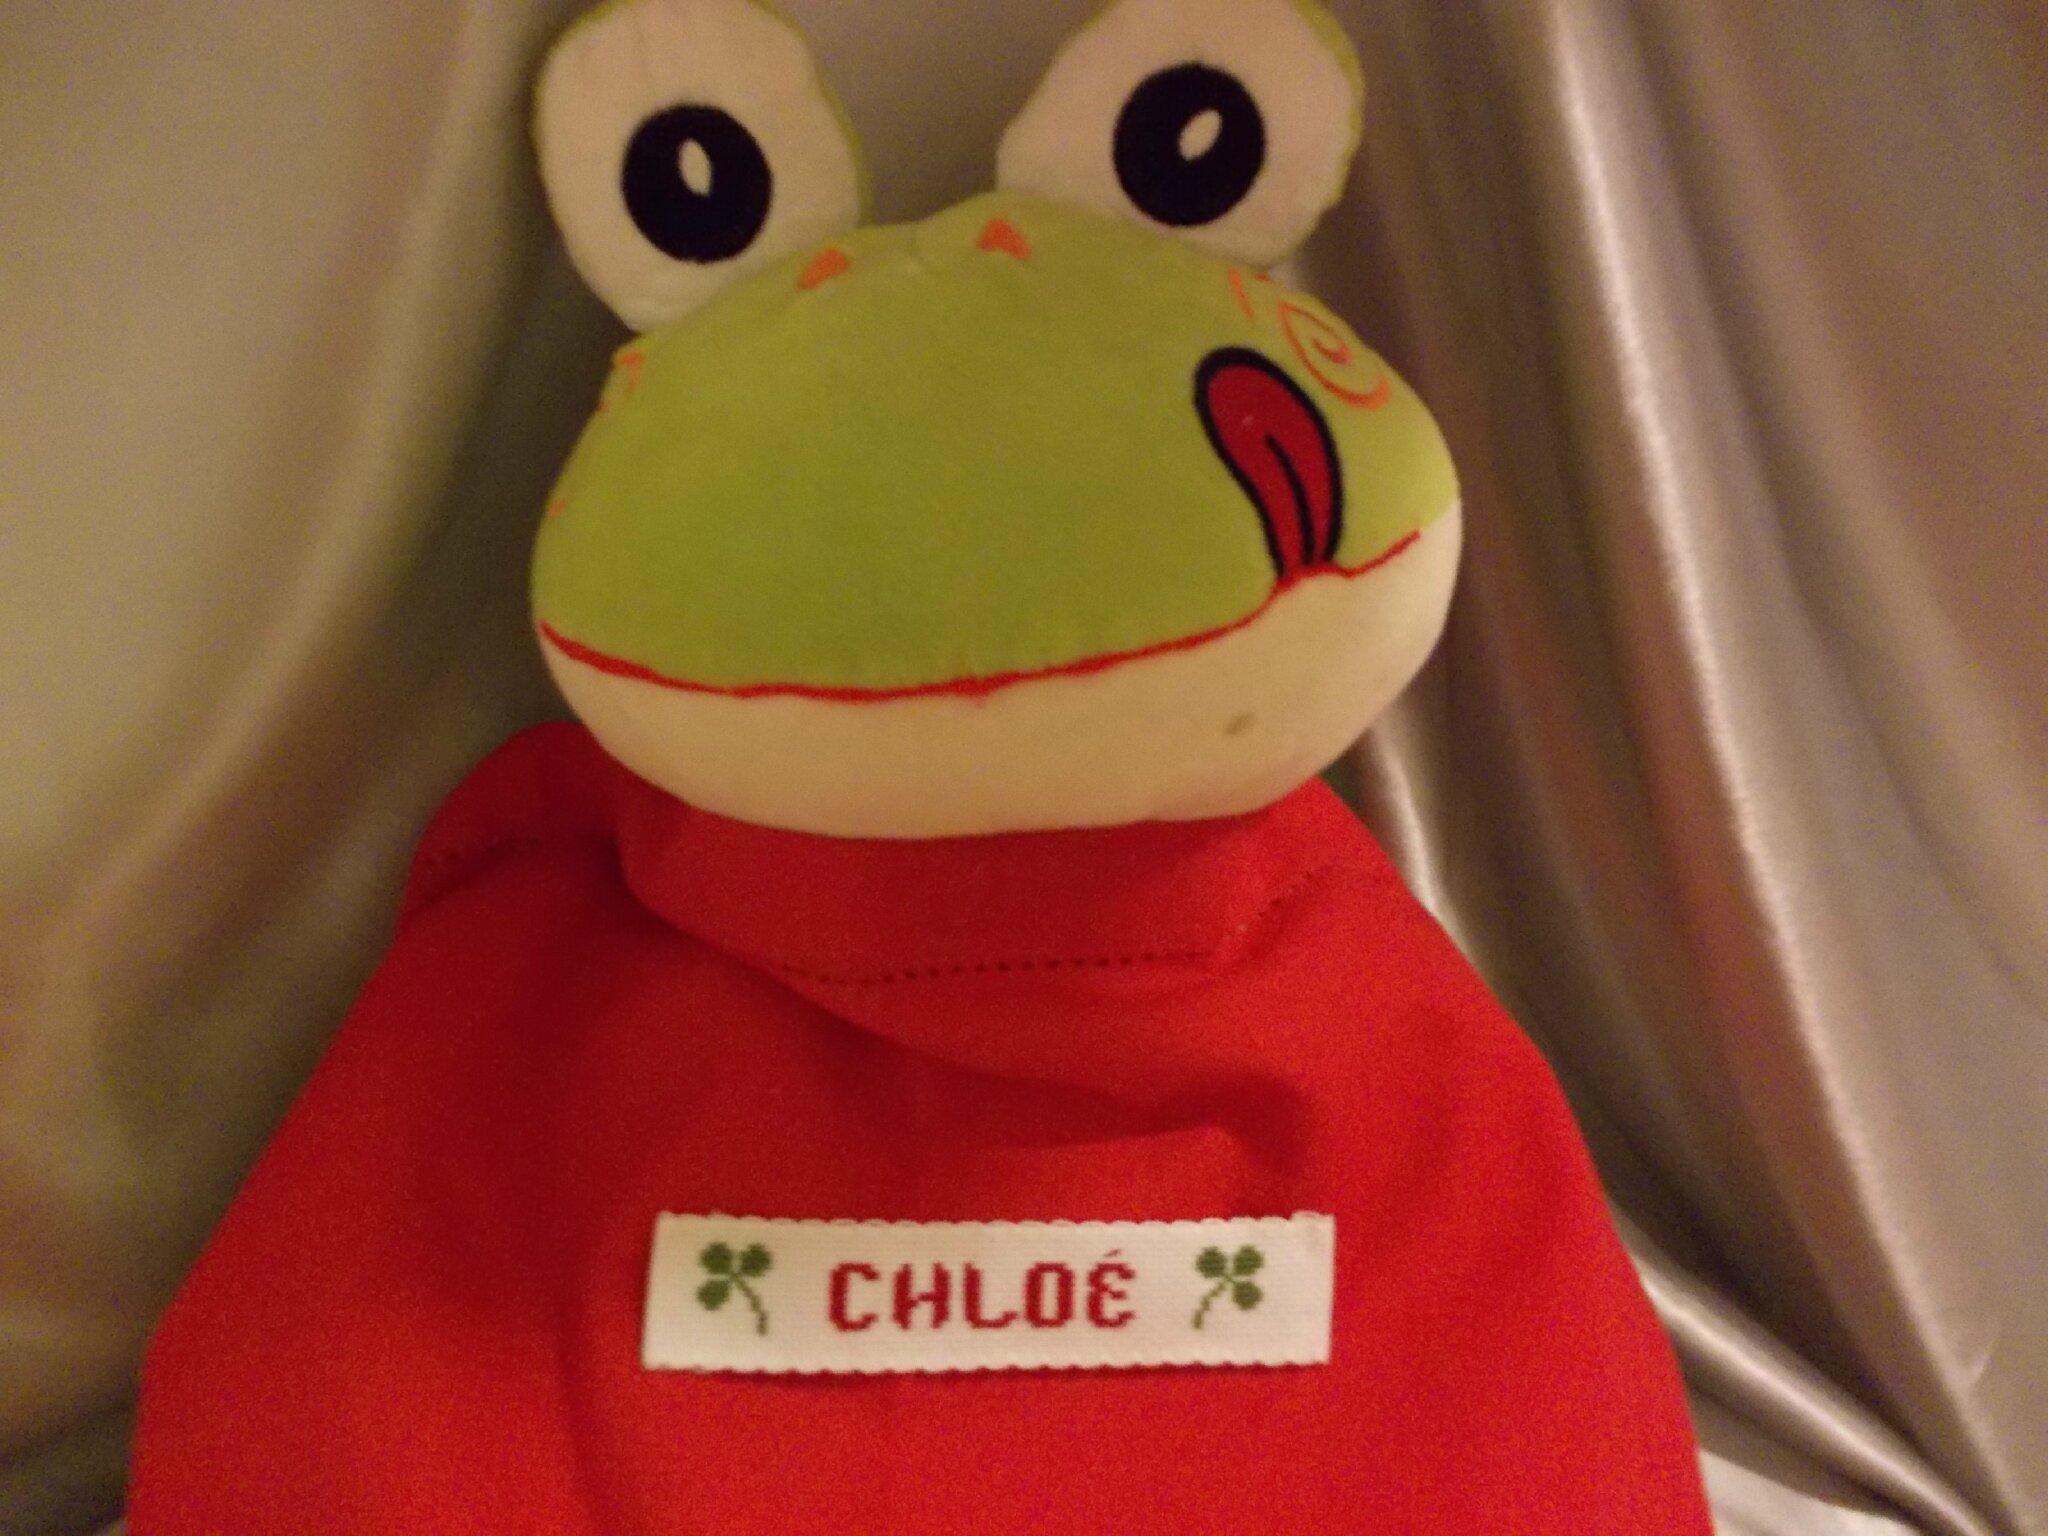 07 - CHLOE - Rge